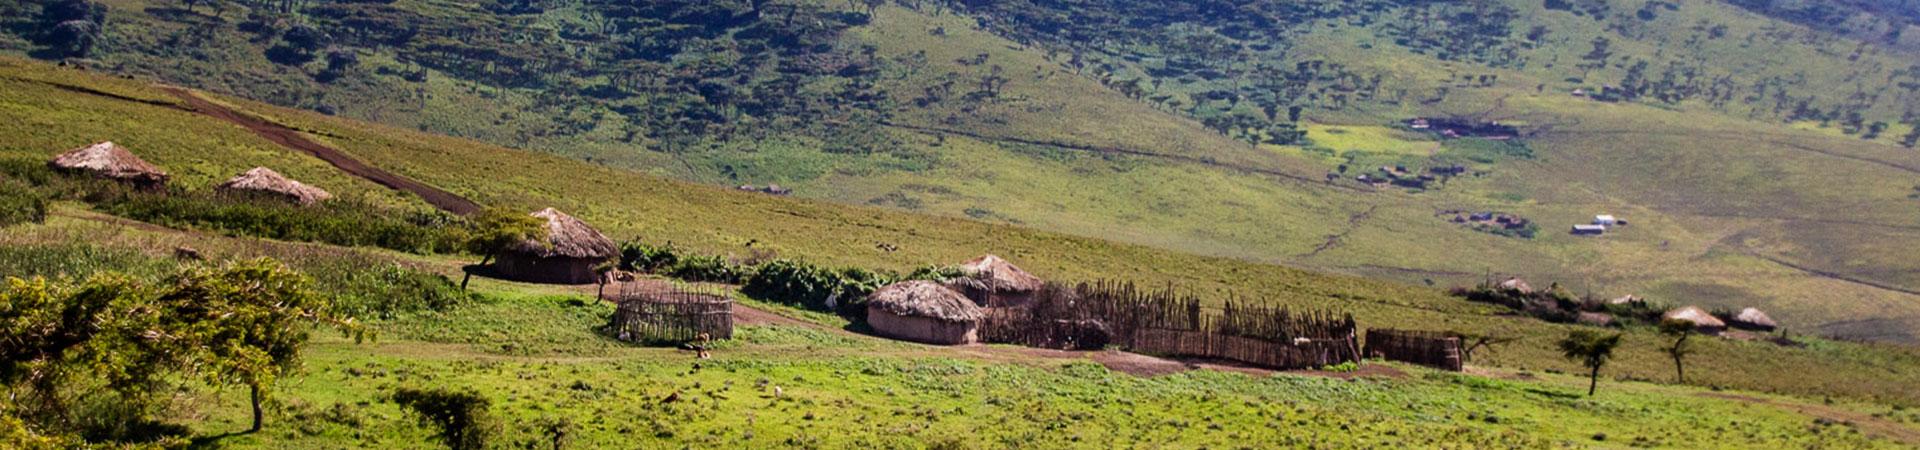 8-Days-Tanzania-Cultural-Safari